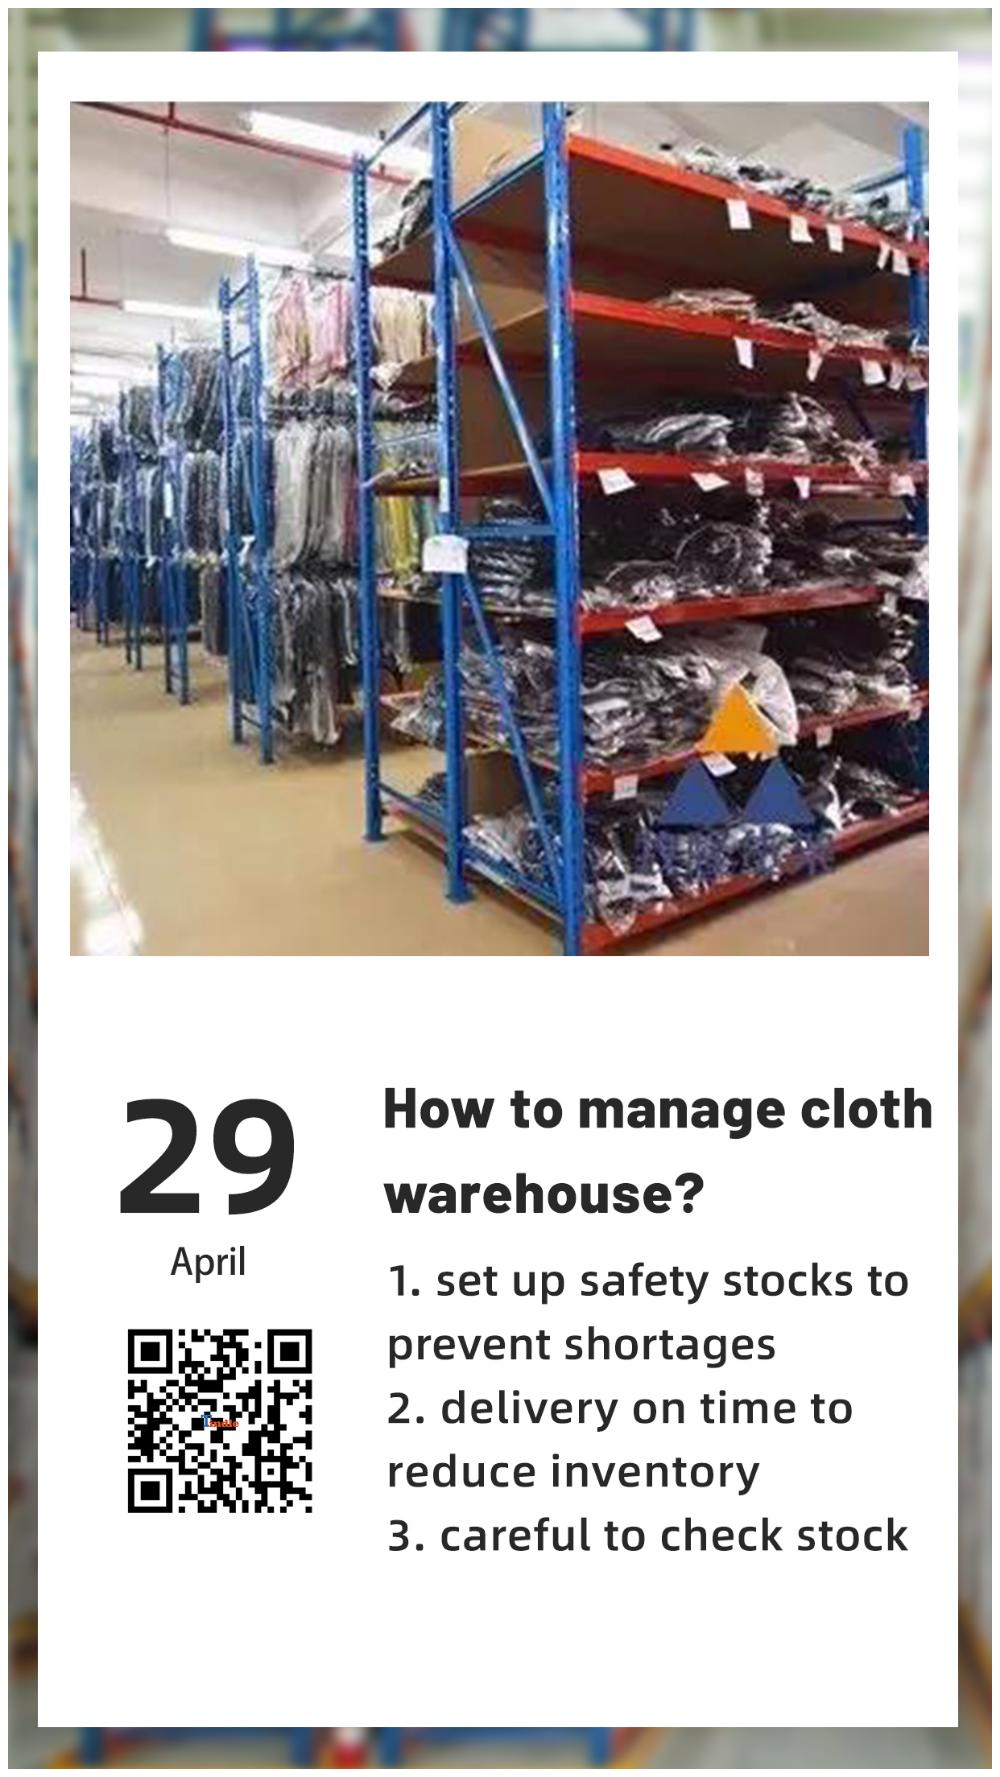 6 Helpful Company Warehouse Setup Tips To Ensure Employee Safety